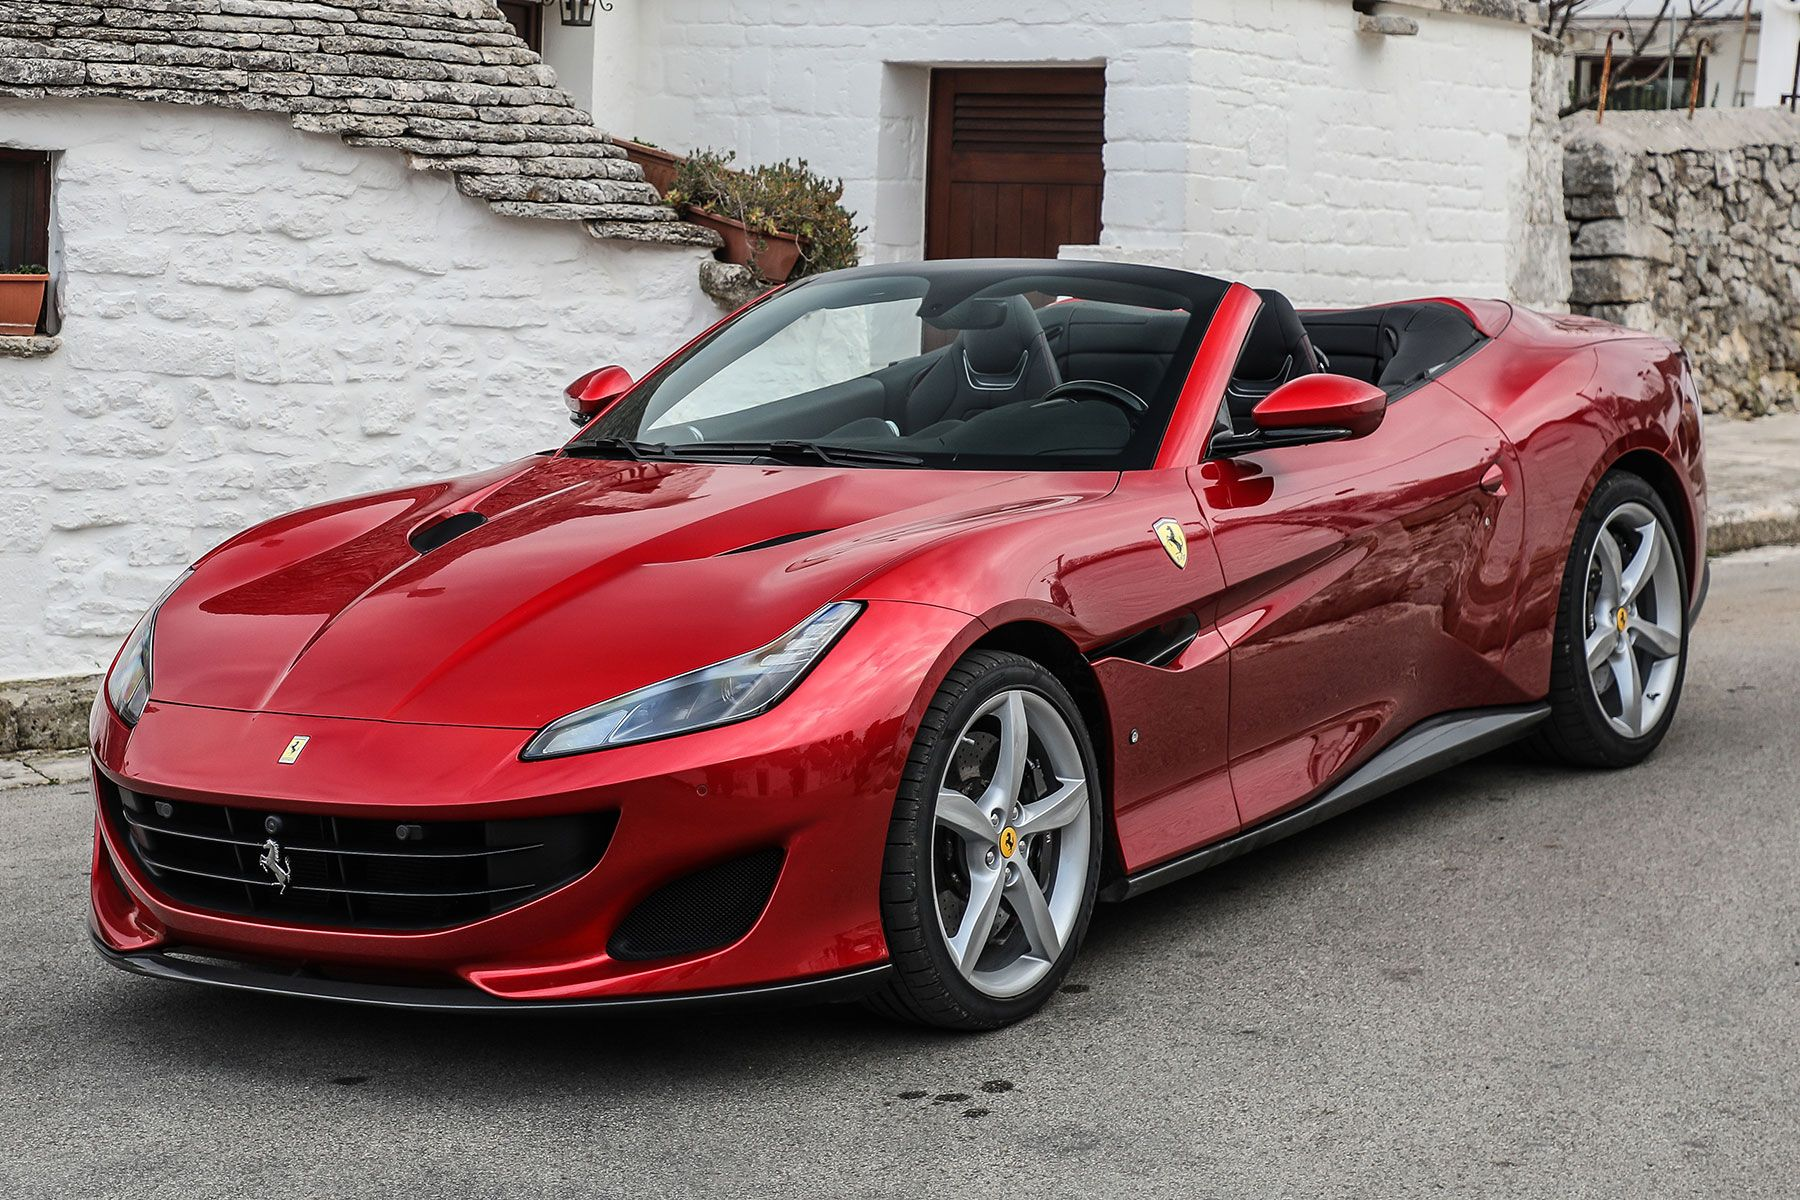 2018 Ferrari Portofino Cars Ferrari Cars Ferrari California